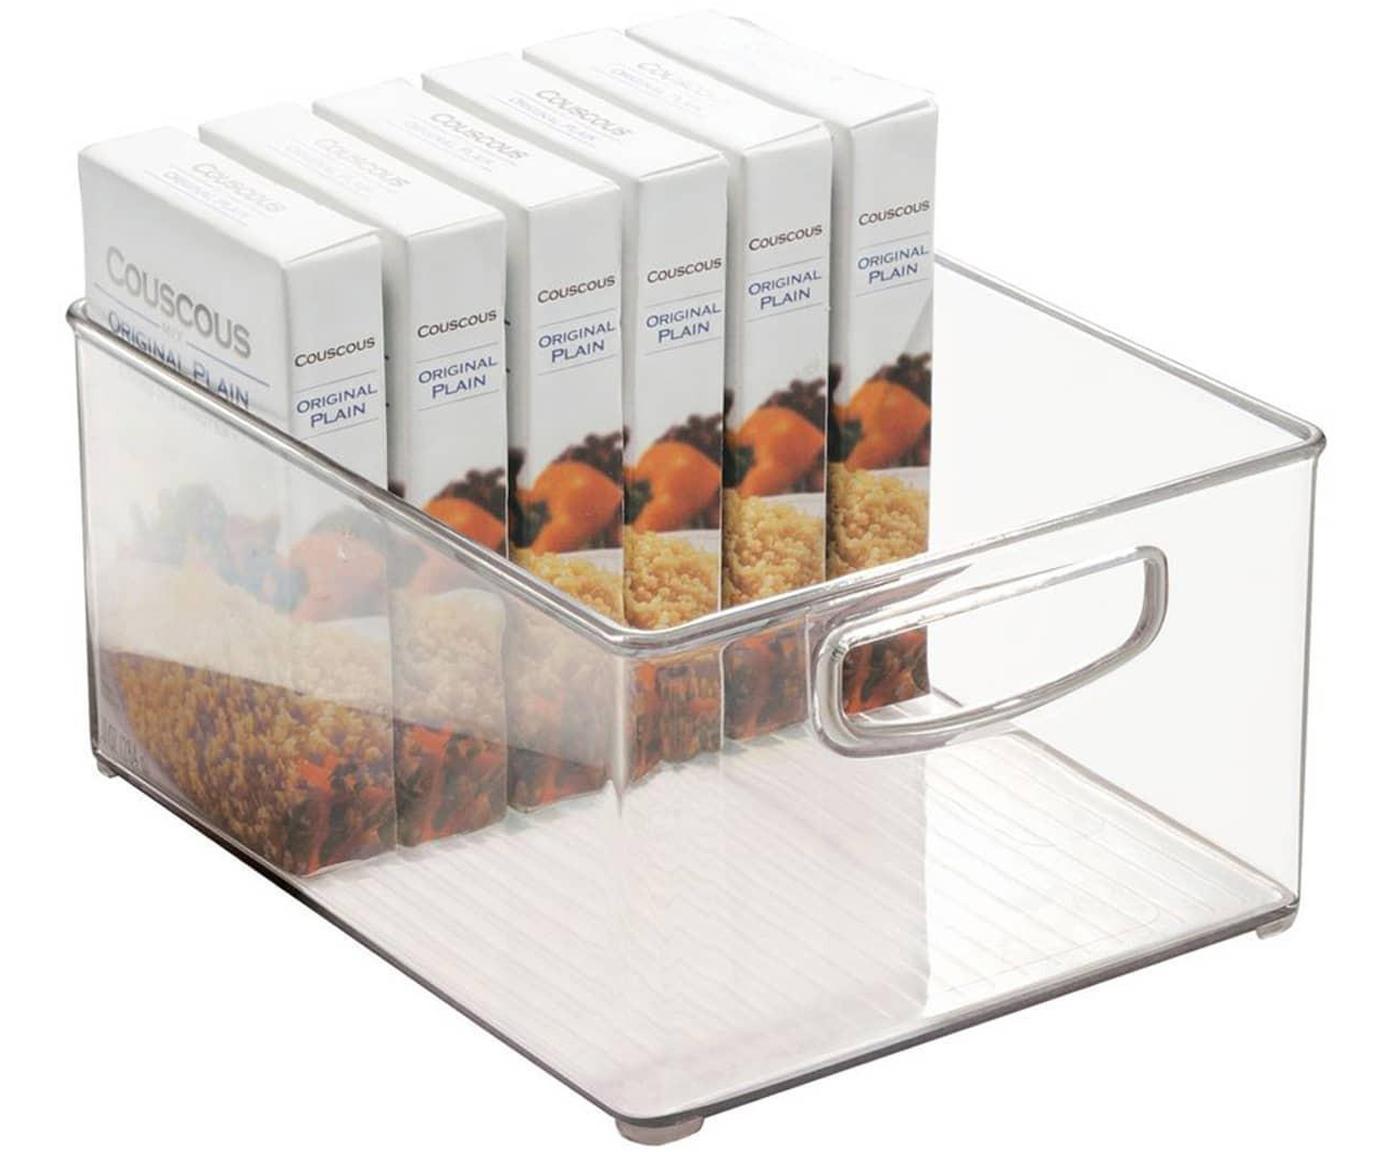 Organizador de cocina Binz, Plástico, Transparente, An 25 x Al 13 cm